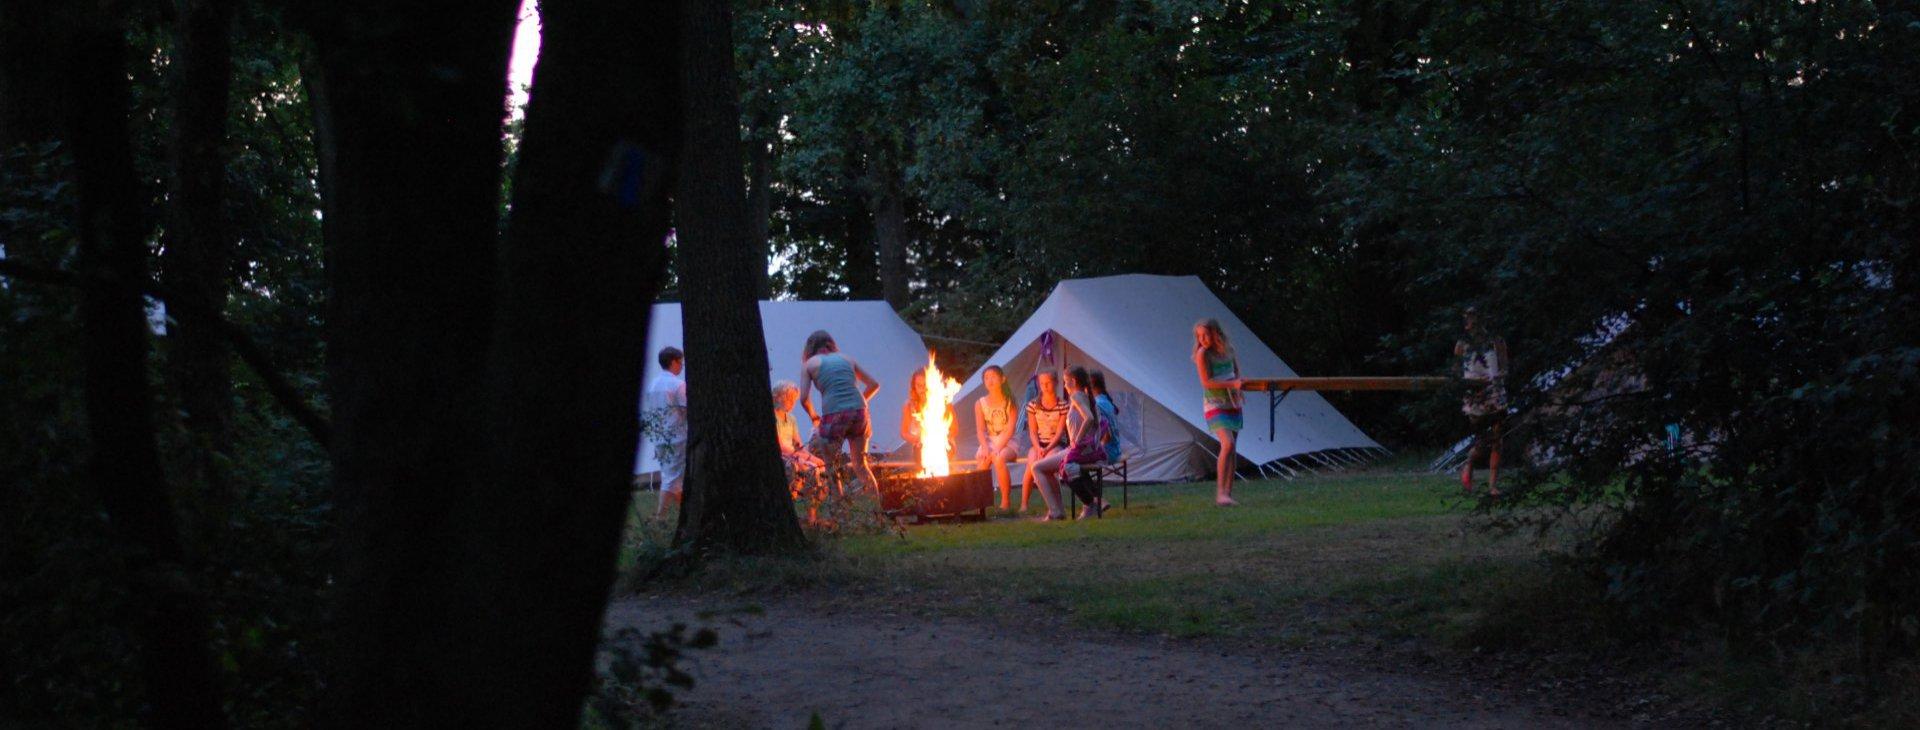 Weekendje weg markant outdoorcentrum for Weekendje weg huisje open haard